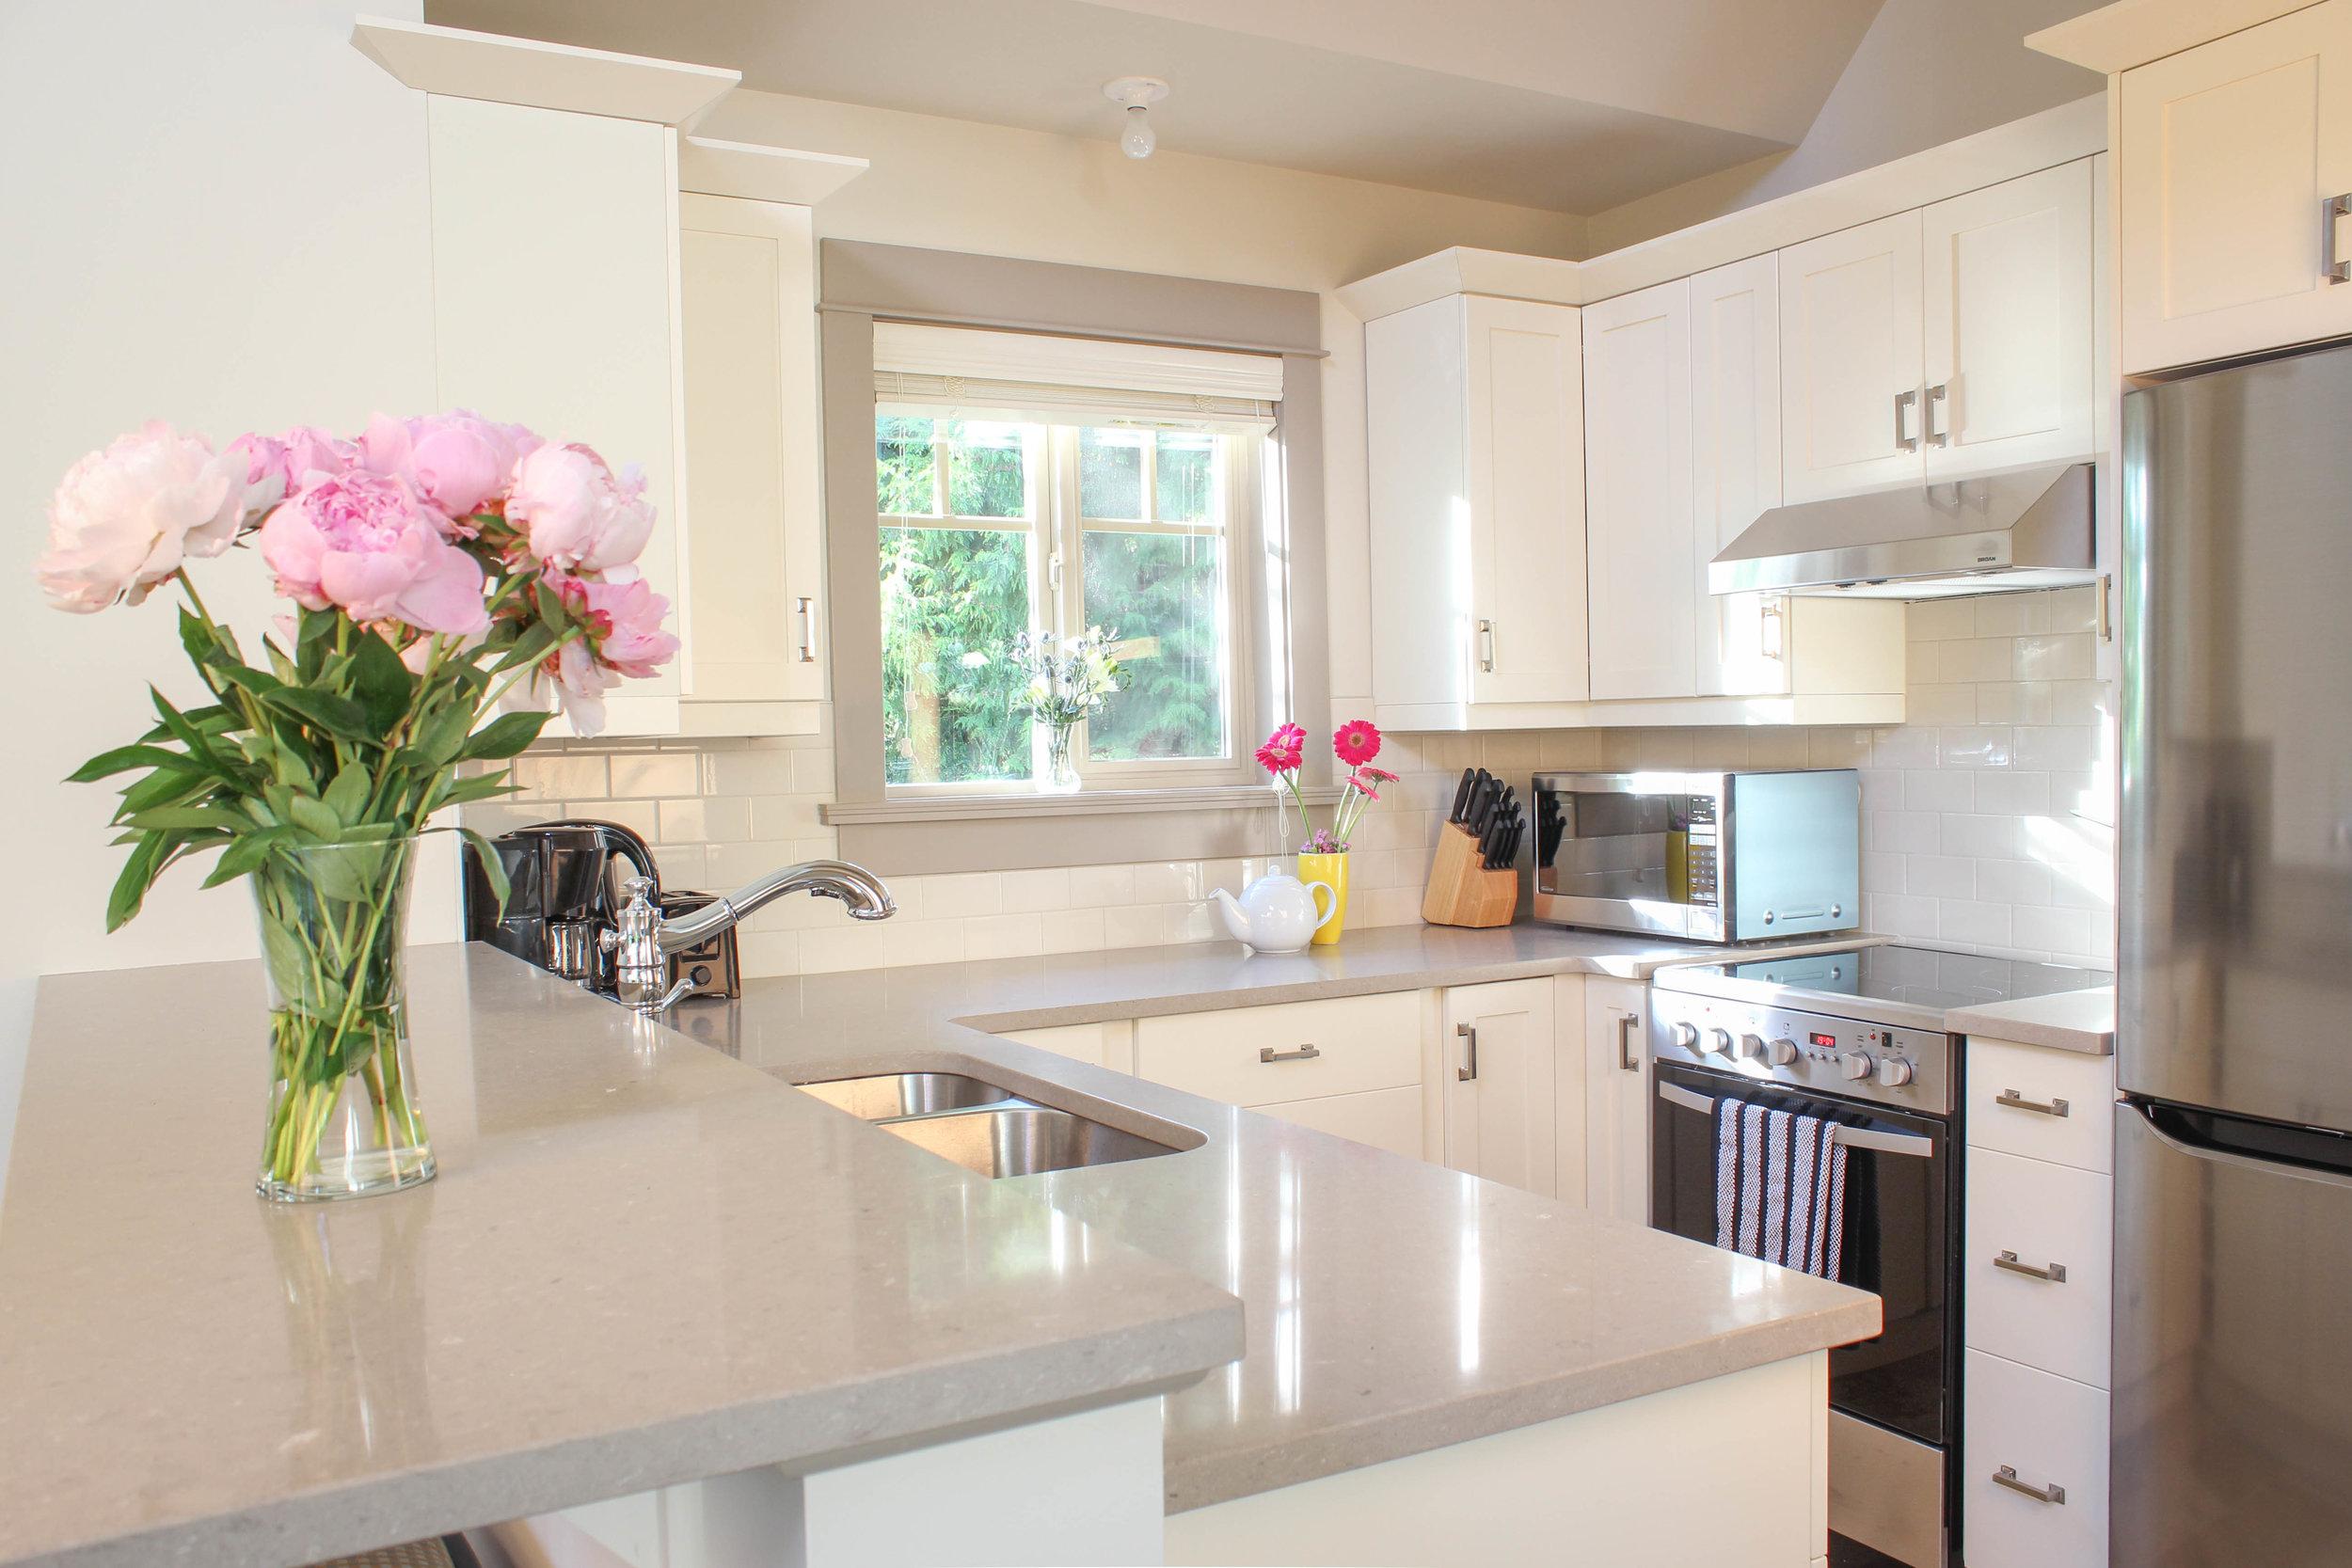 Quartz or granite countertops (cottage dependant) and tile backsplash